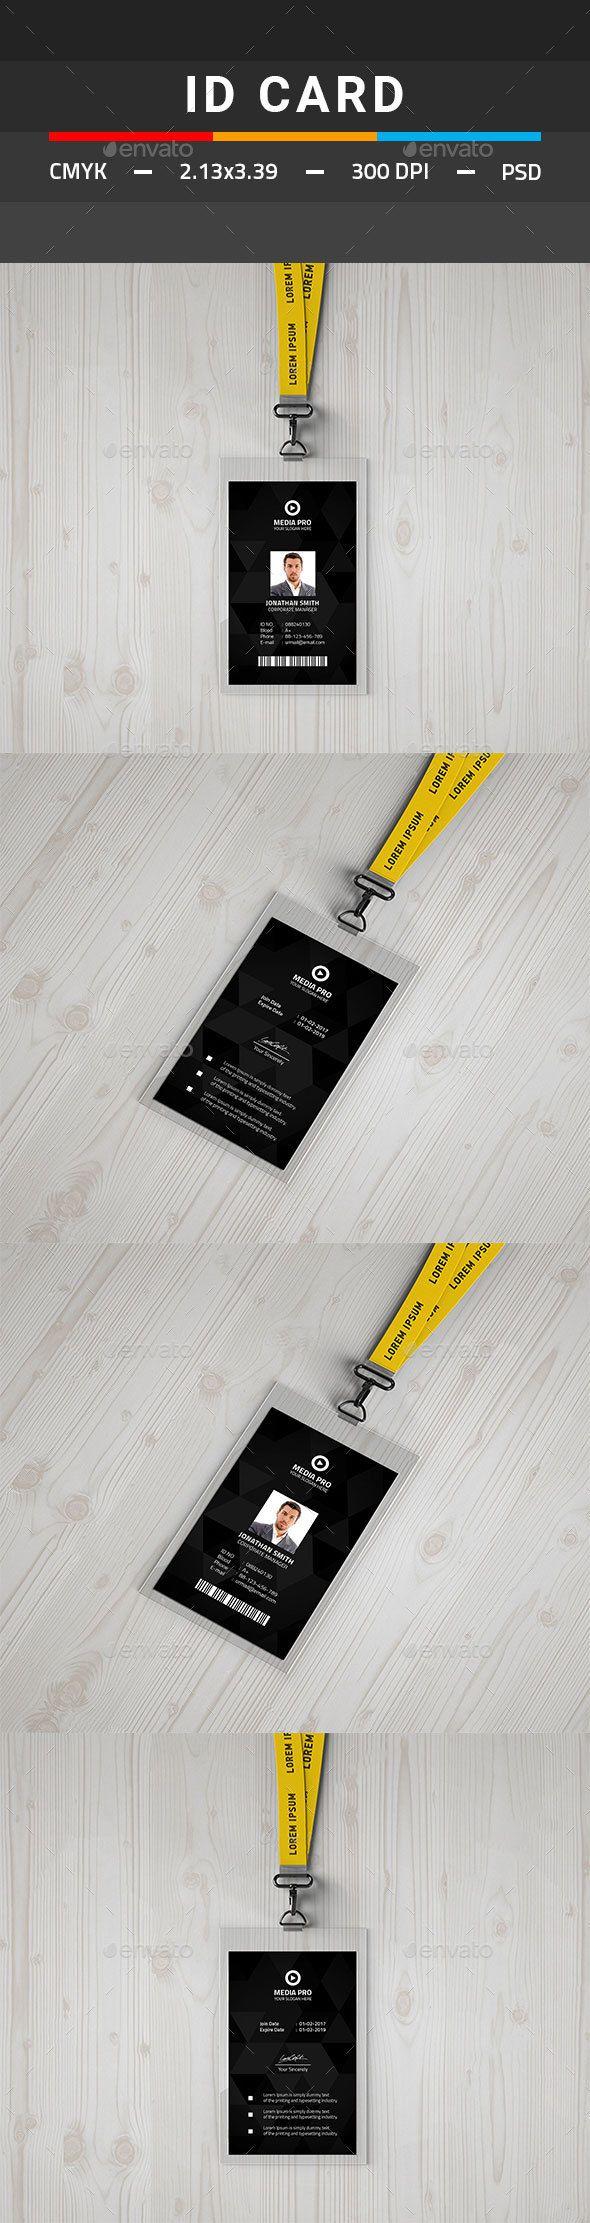 ID Card - Miscellaneous Print Templates | logo | Pinterest | Print ...